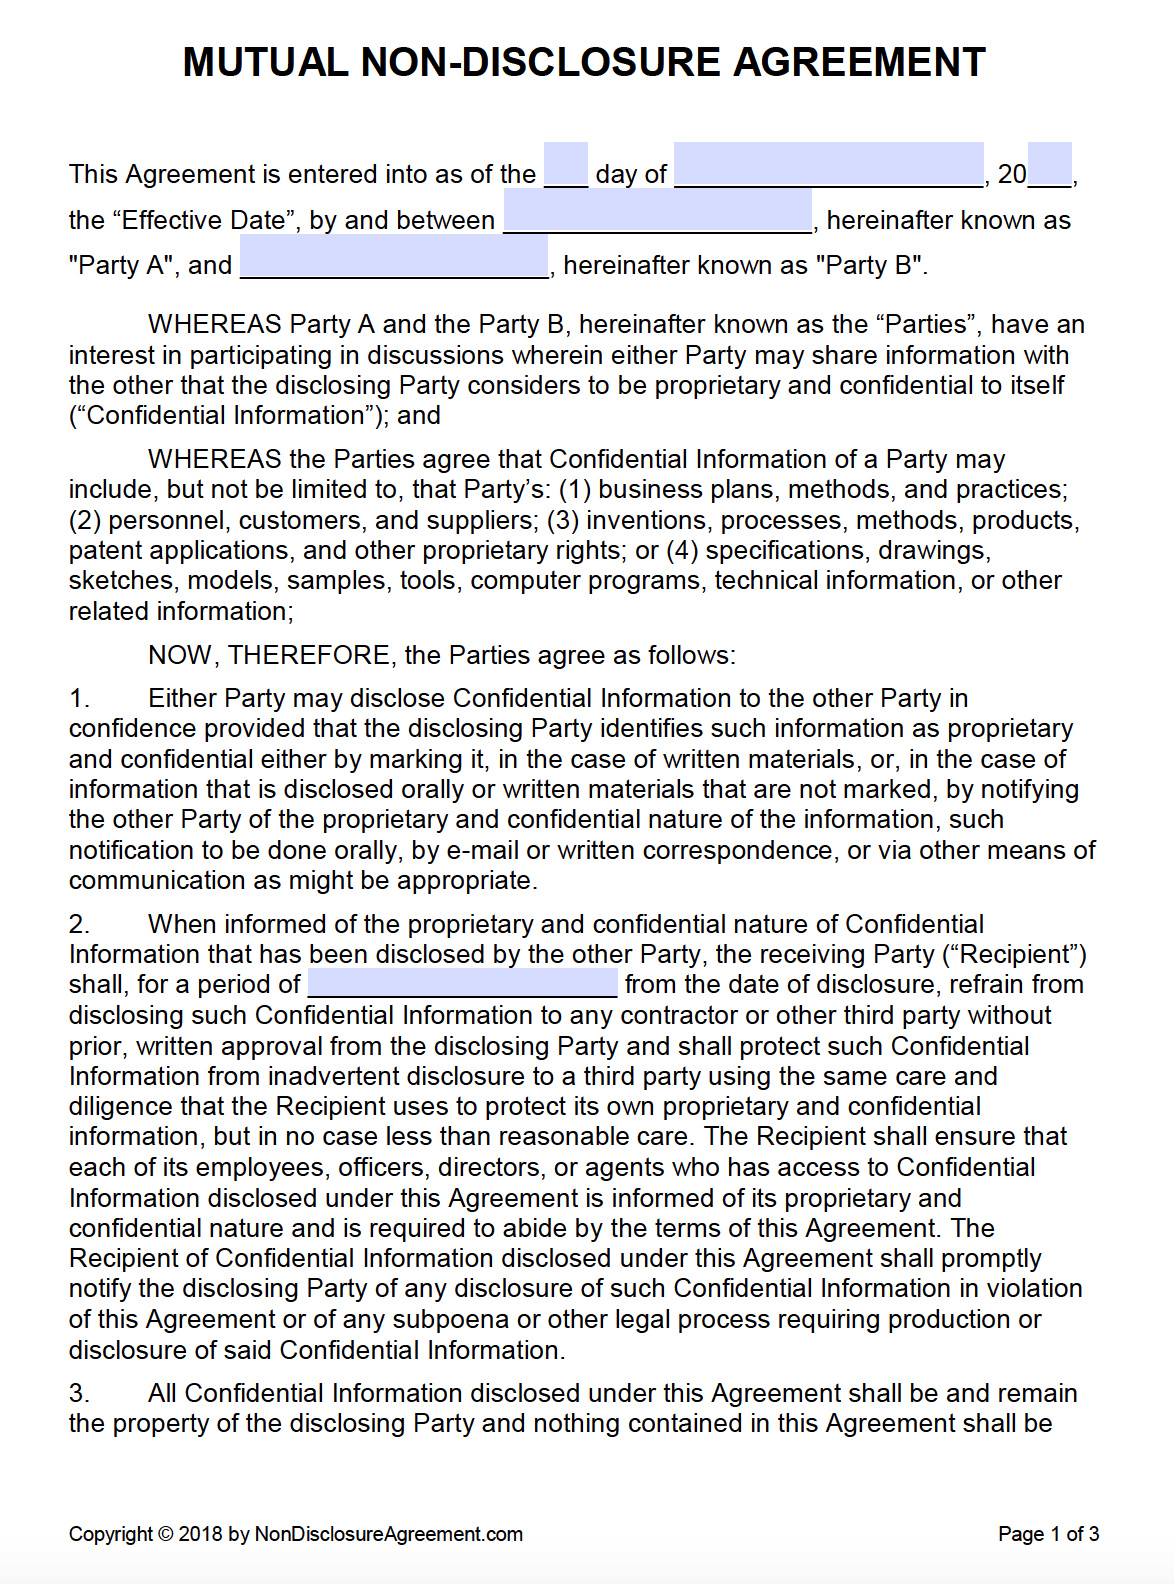 Free Mutual Nondisclosure Agreement Nda  Pdf  Word Docx Pertaining To Free Mutual Non Disclosure Agreement Template